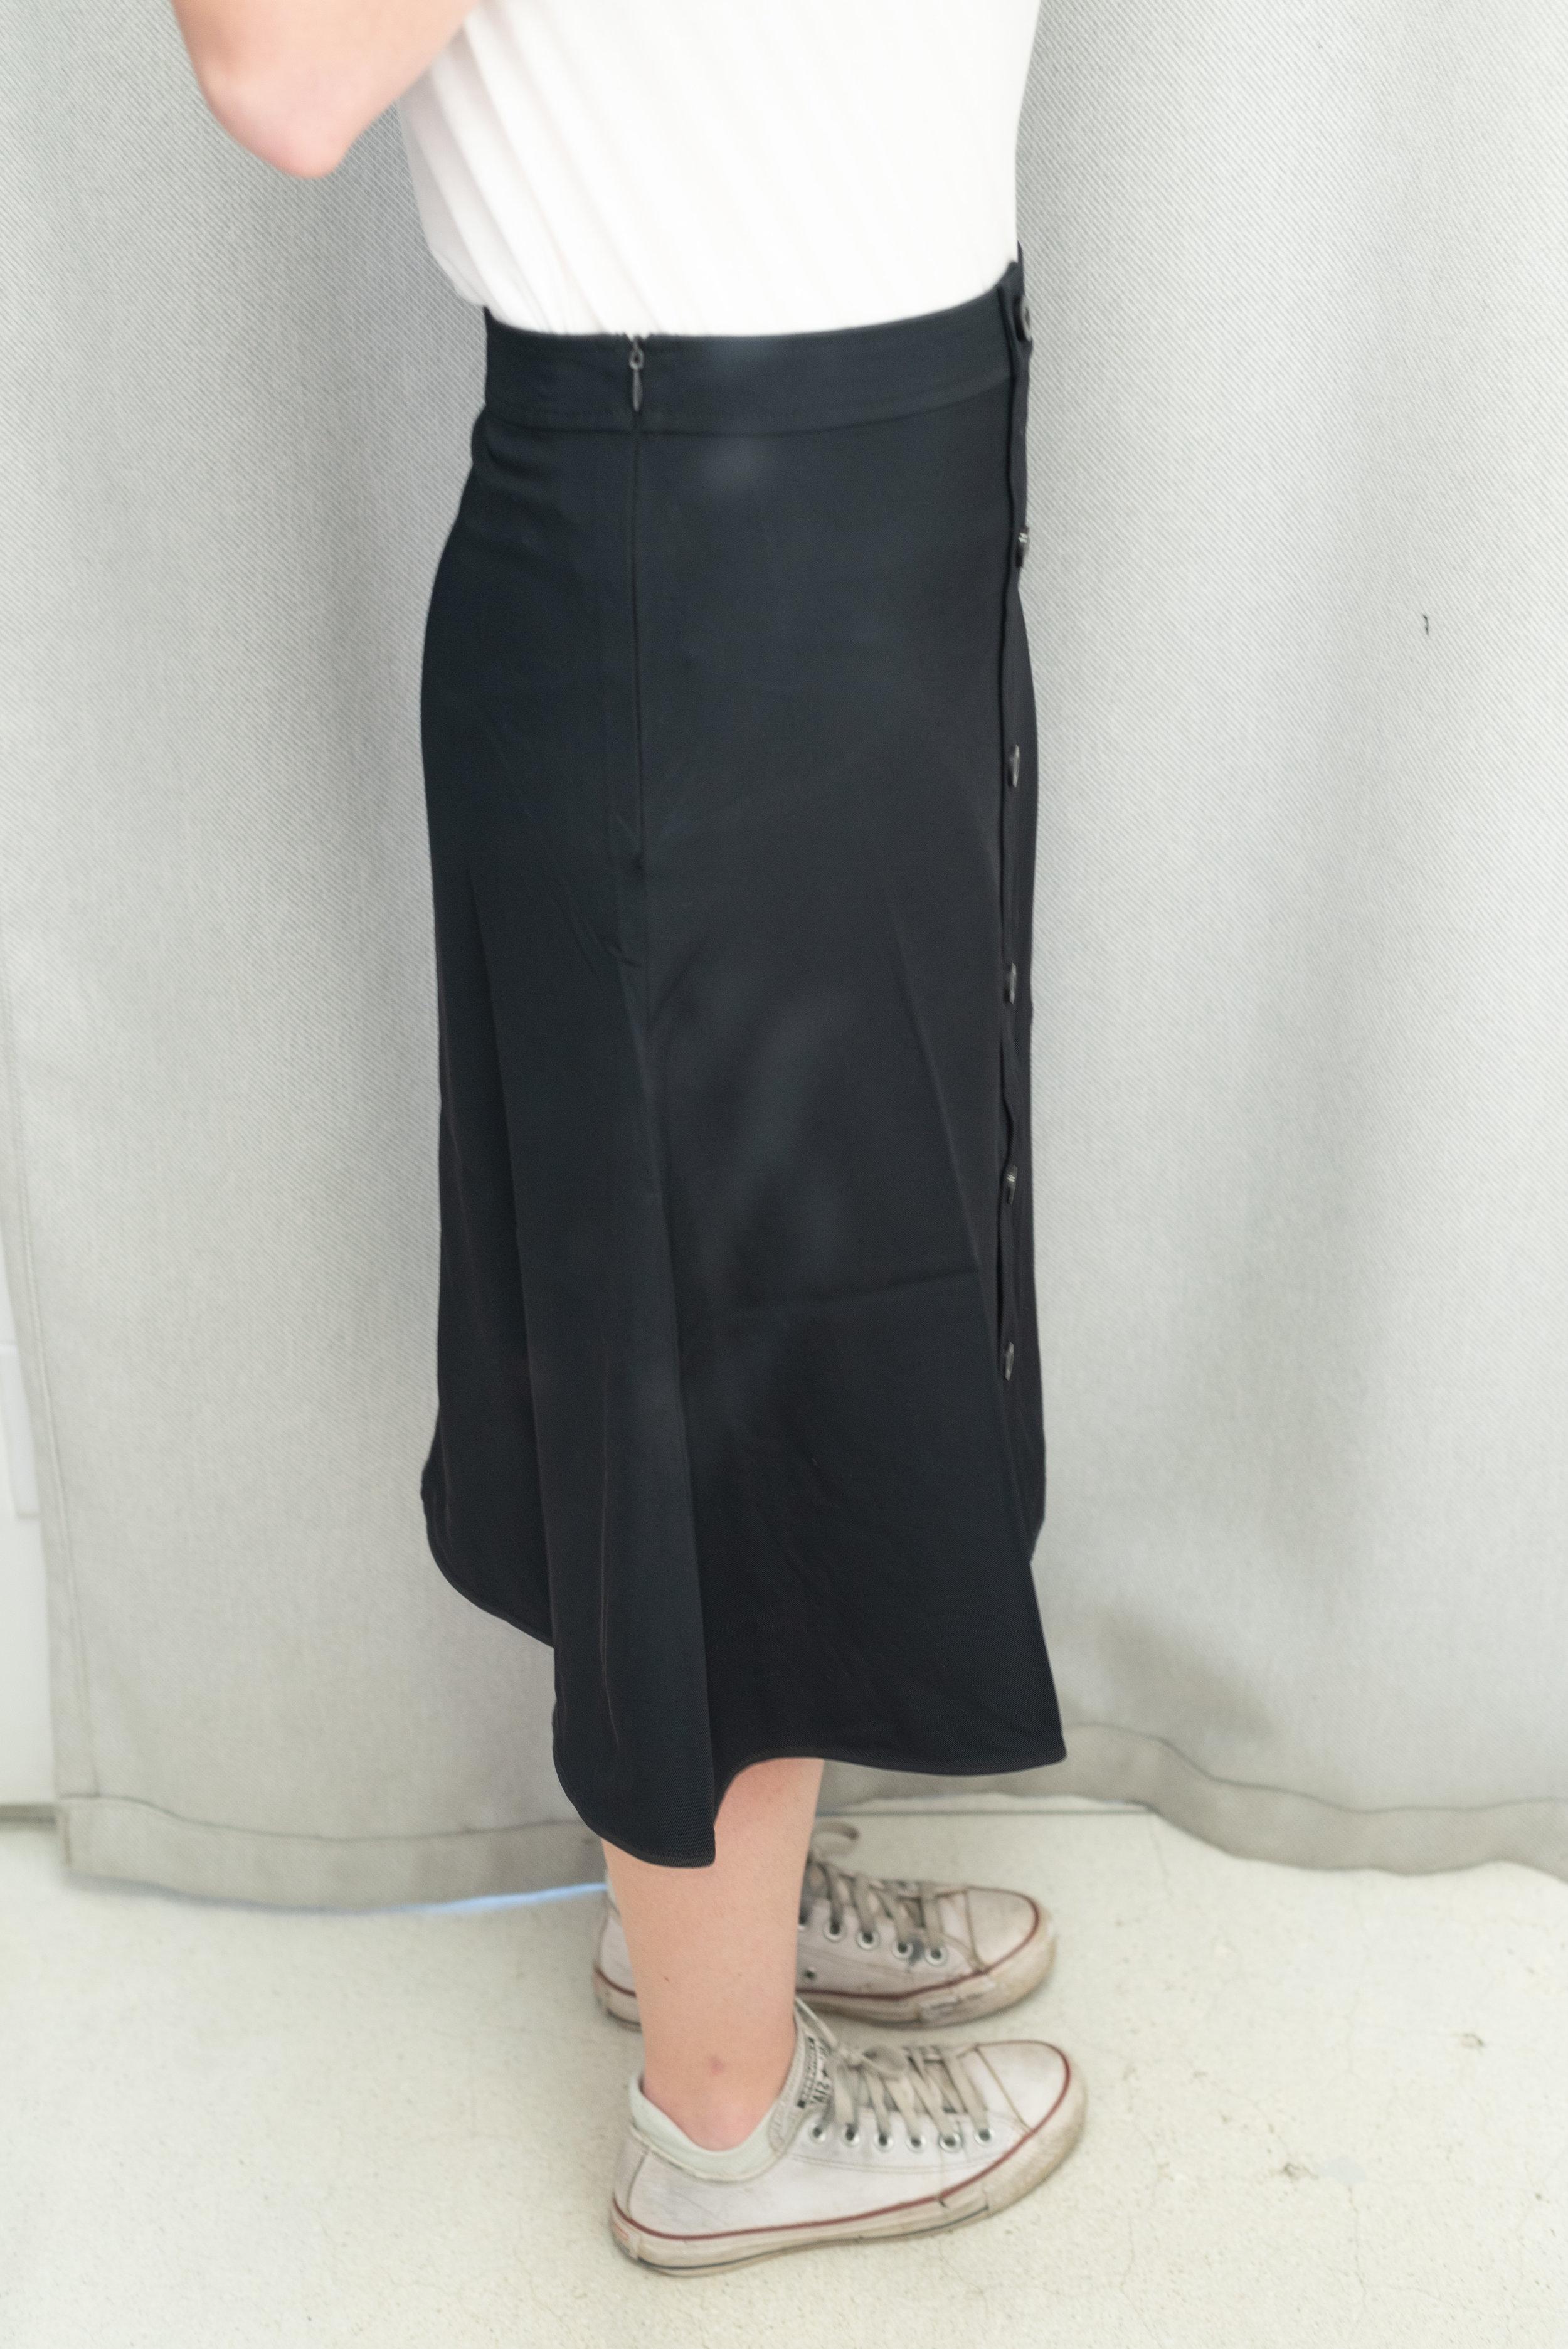 Everlane The Japanese GoWeave Swing Skirt - Size 6